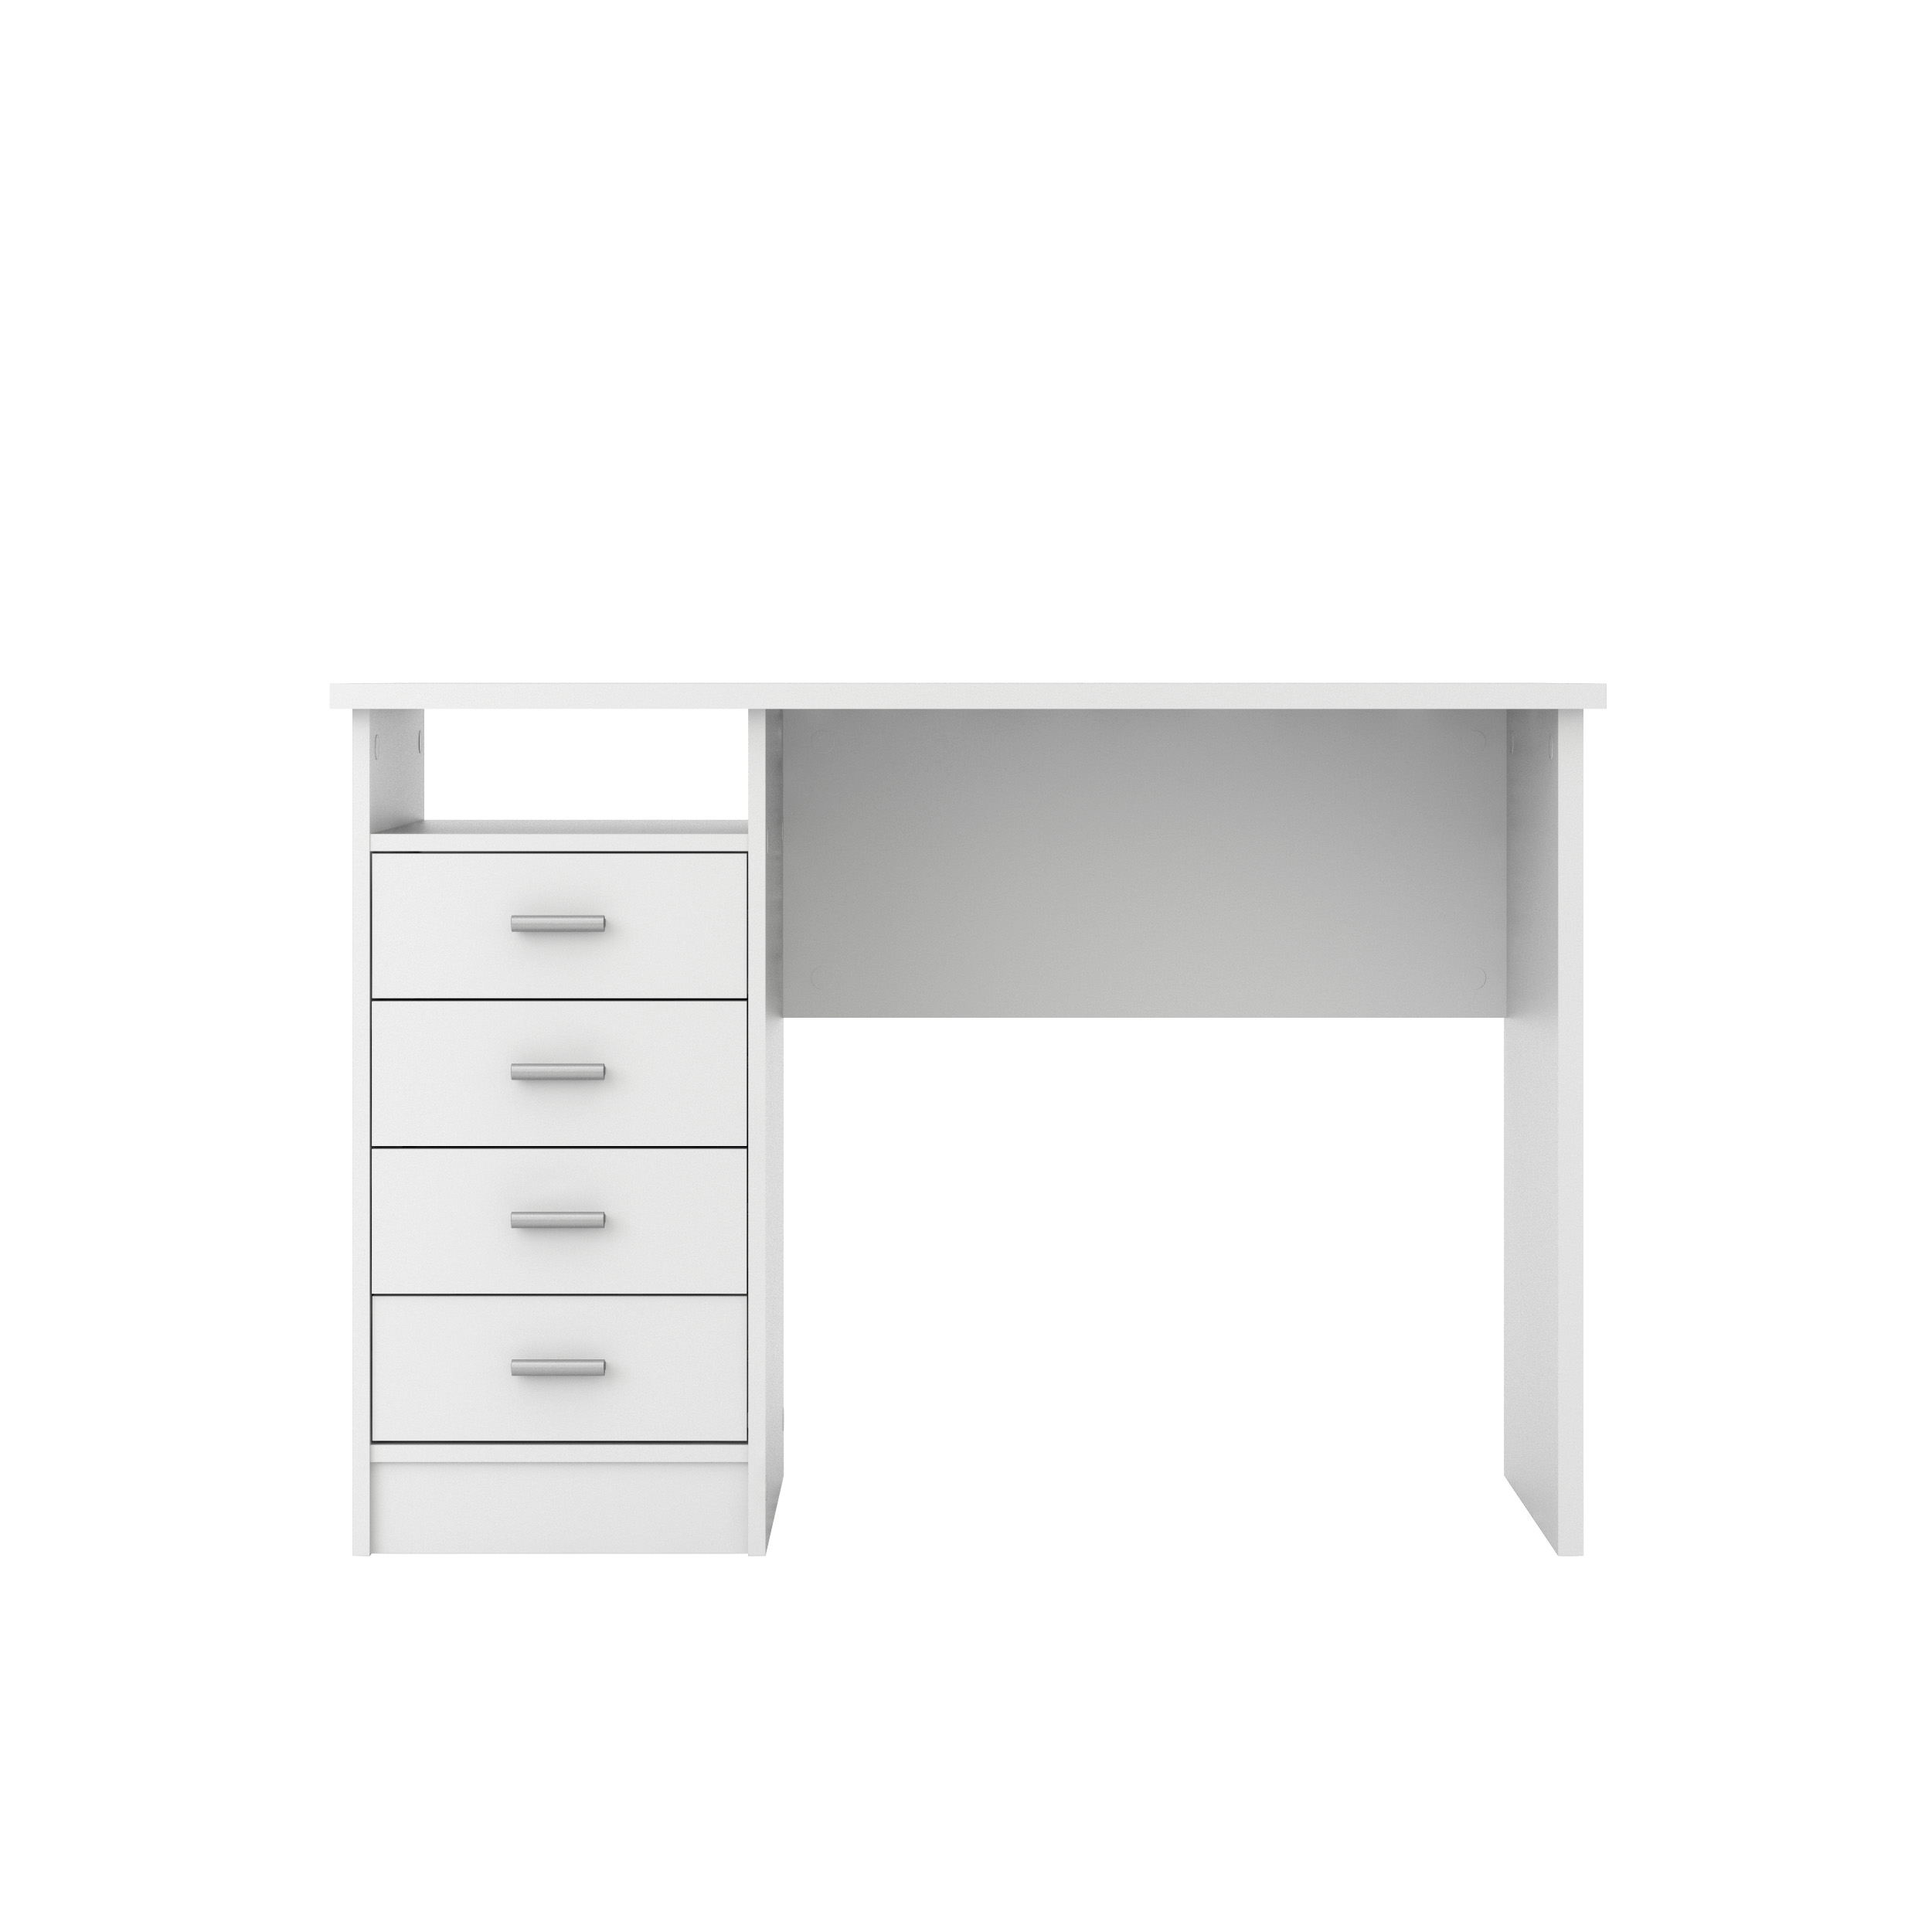 Tvilum Warner Computer Desk with Drawers, White Finish - Walmart.com